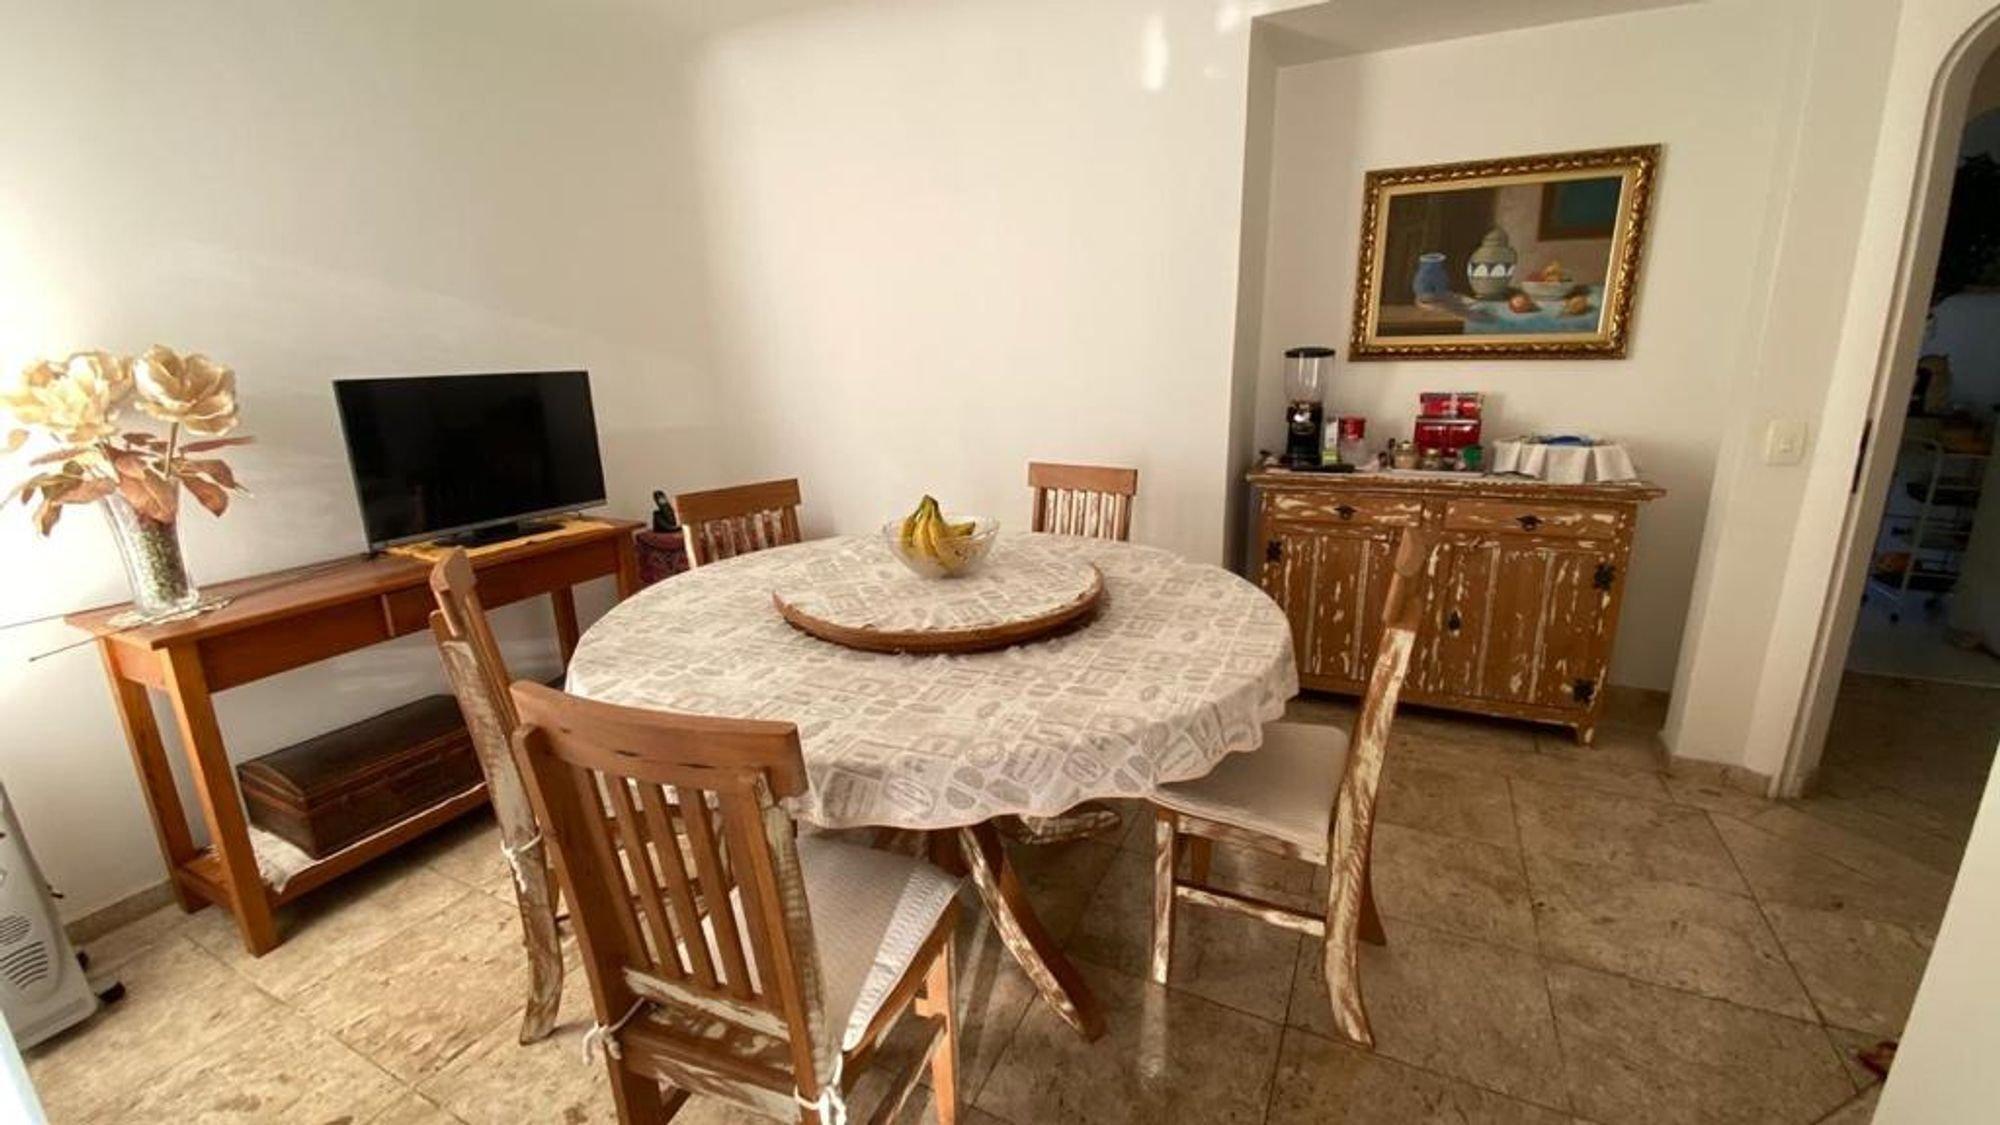 Foto de Sala com televisão, vaso, cadeira, mesa de jantar